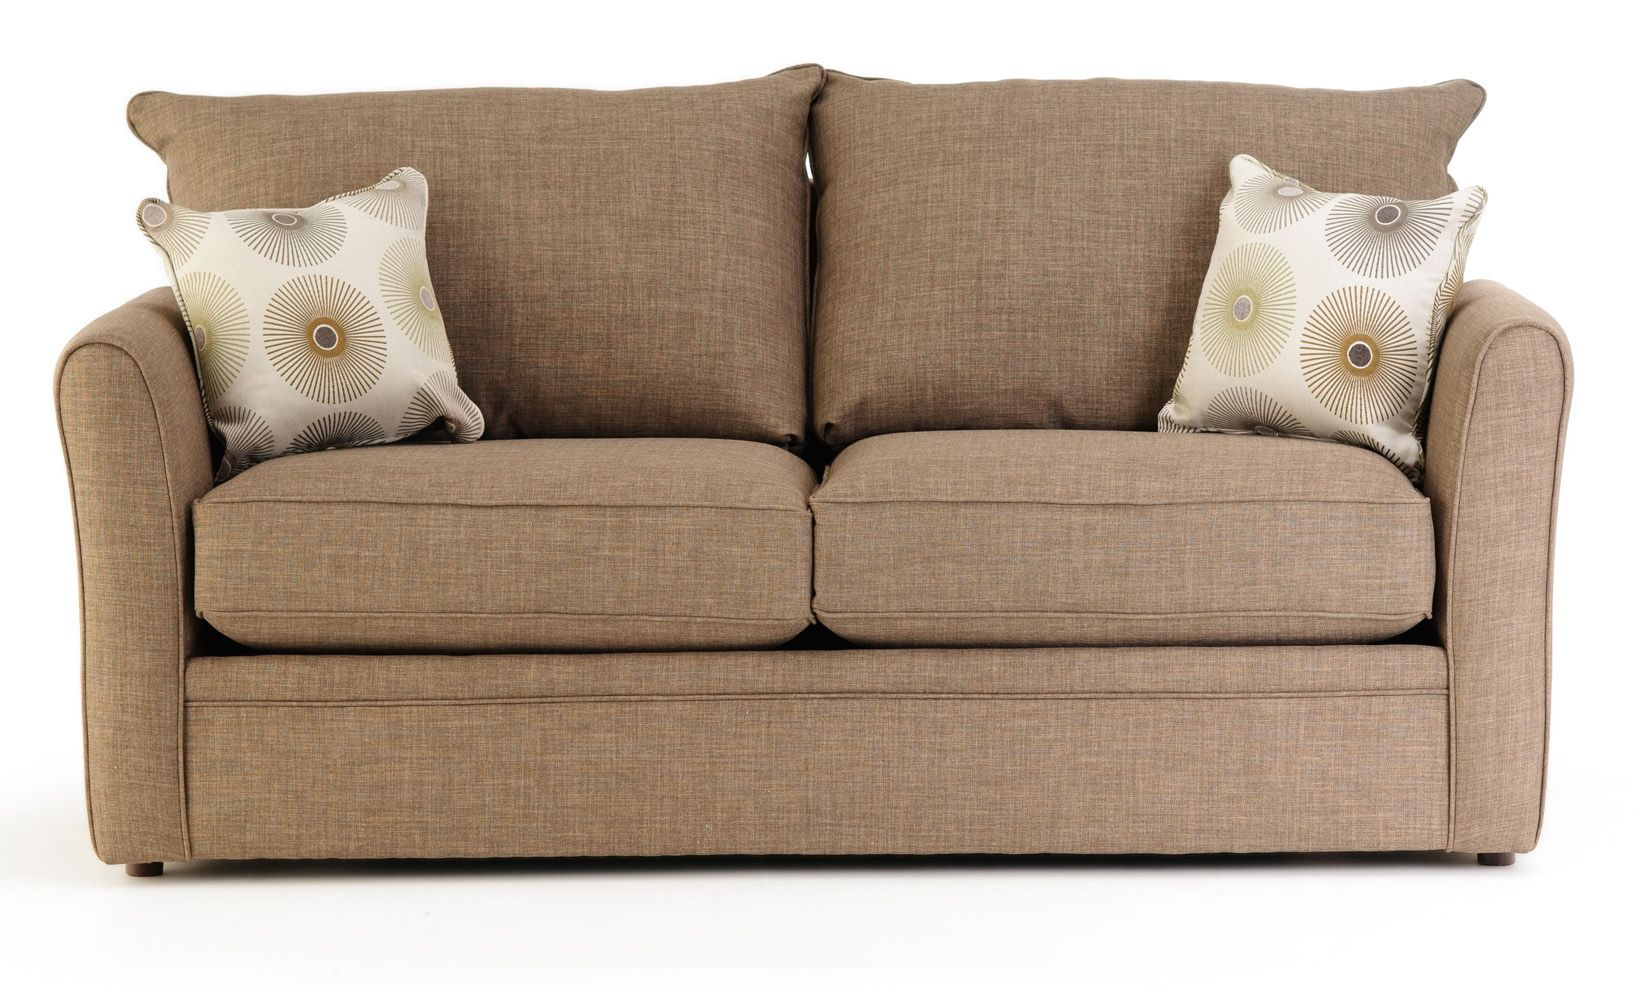 Sleeper sofas with memory foam mattresses - A Cozy And Comfy Sofa That Hides A Secret A Full Sized Memory Foam Mattress Inside Polyester Cc S Hardwood Frame High Density Foam Seat Cushions Fiber